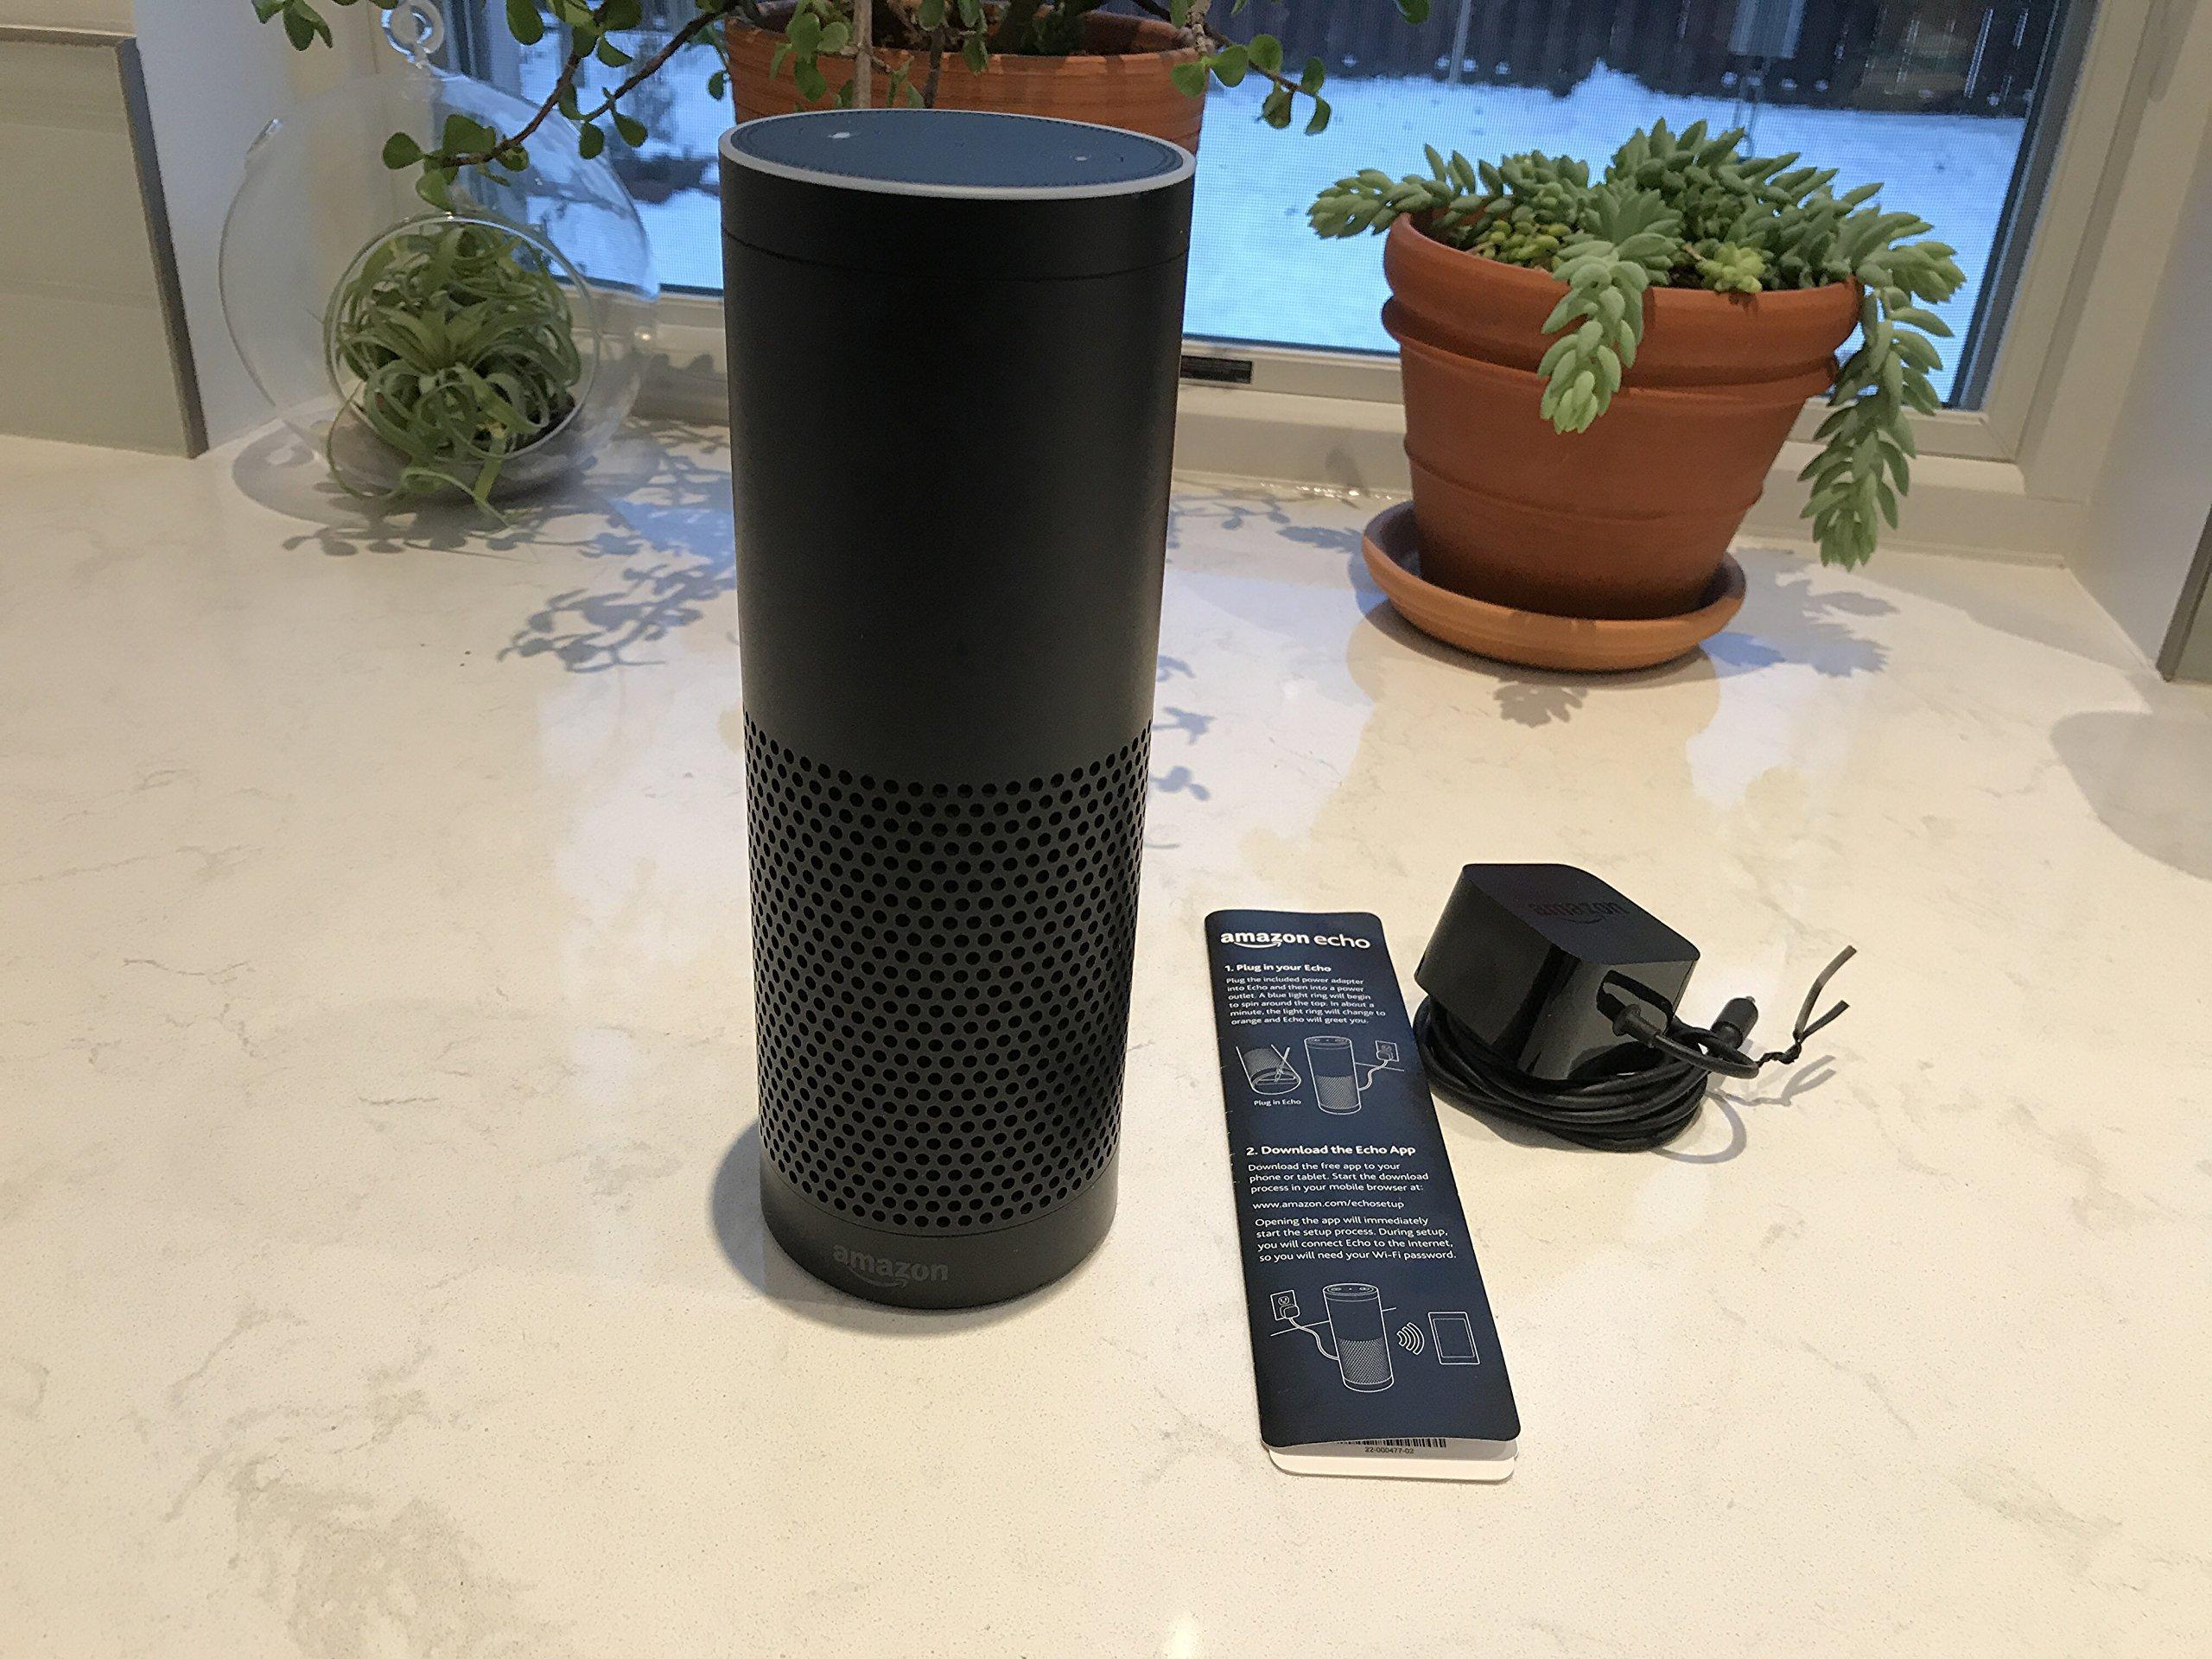 Amazon Echo Black (1st Generation)